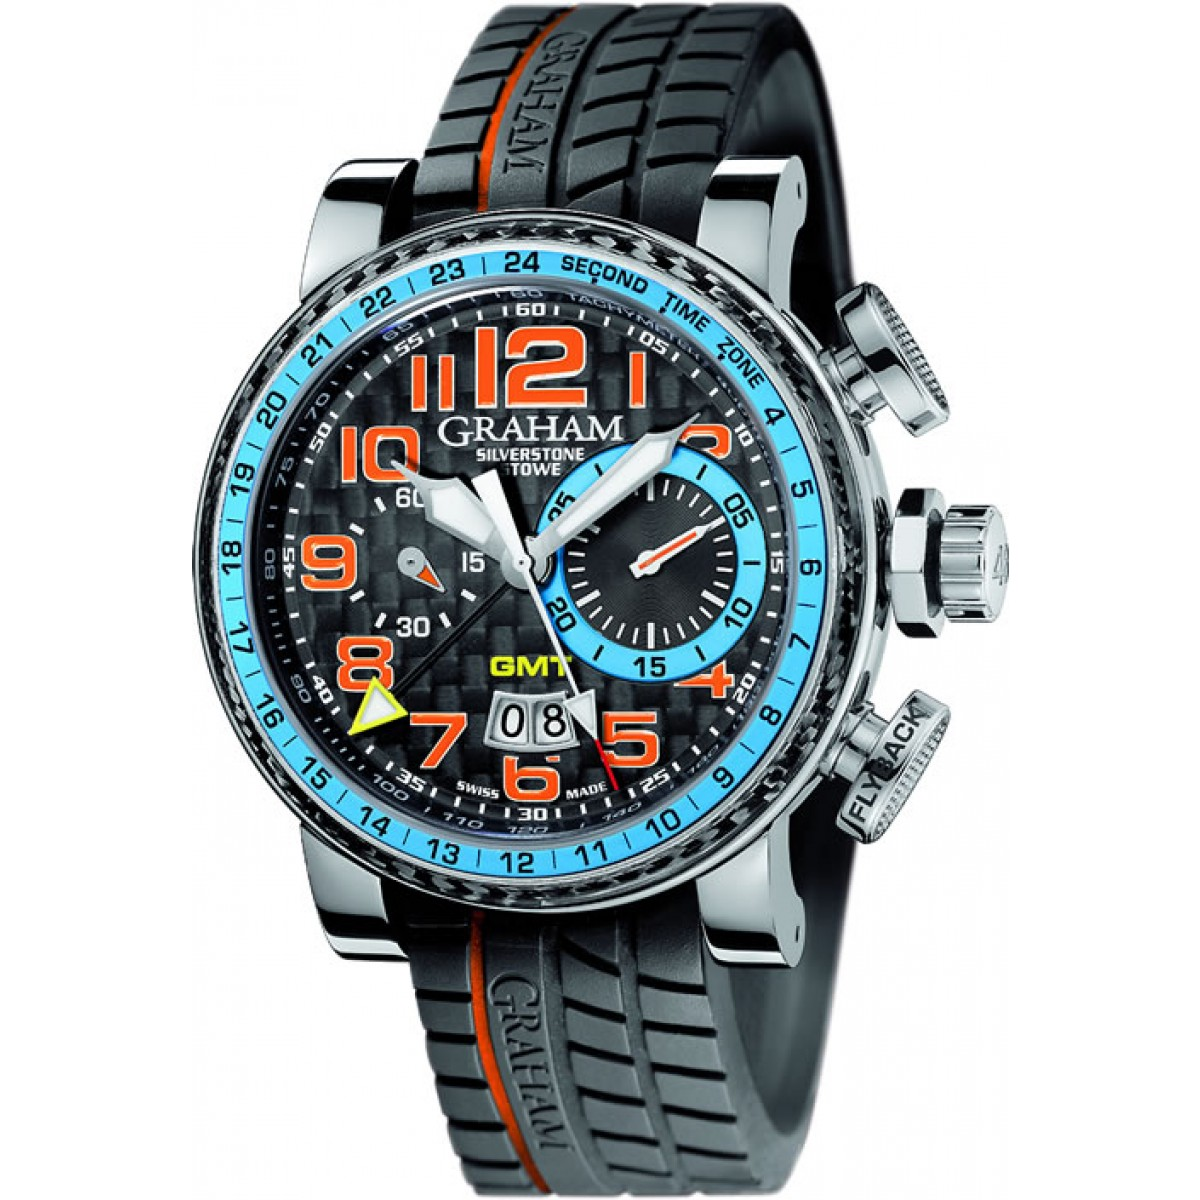 79888d7b40b Relógio Réplica Graham Silverstone